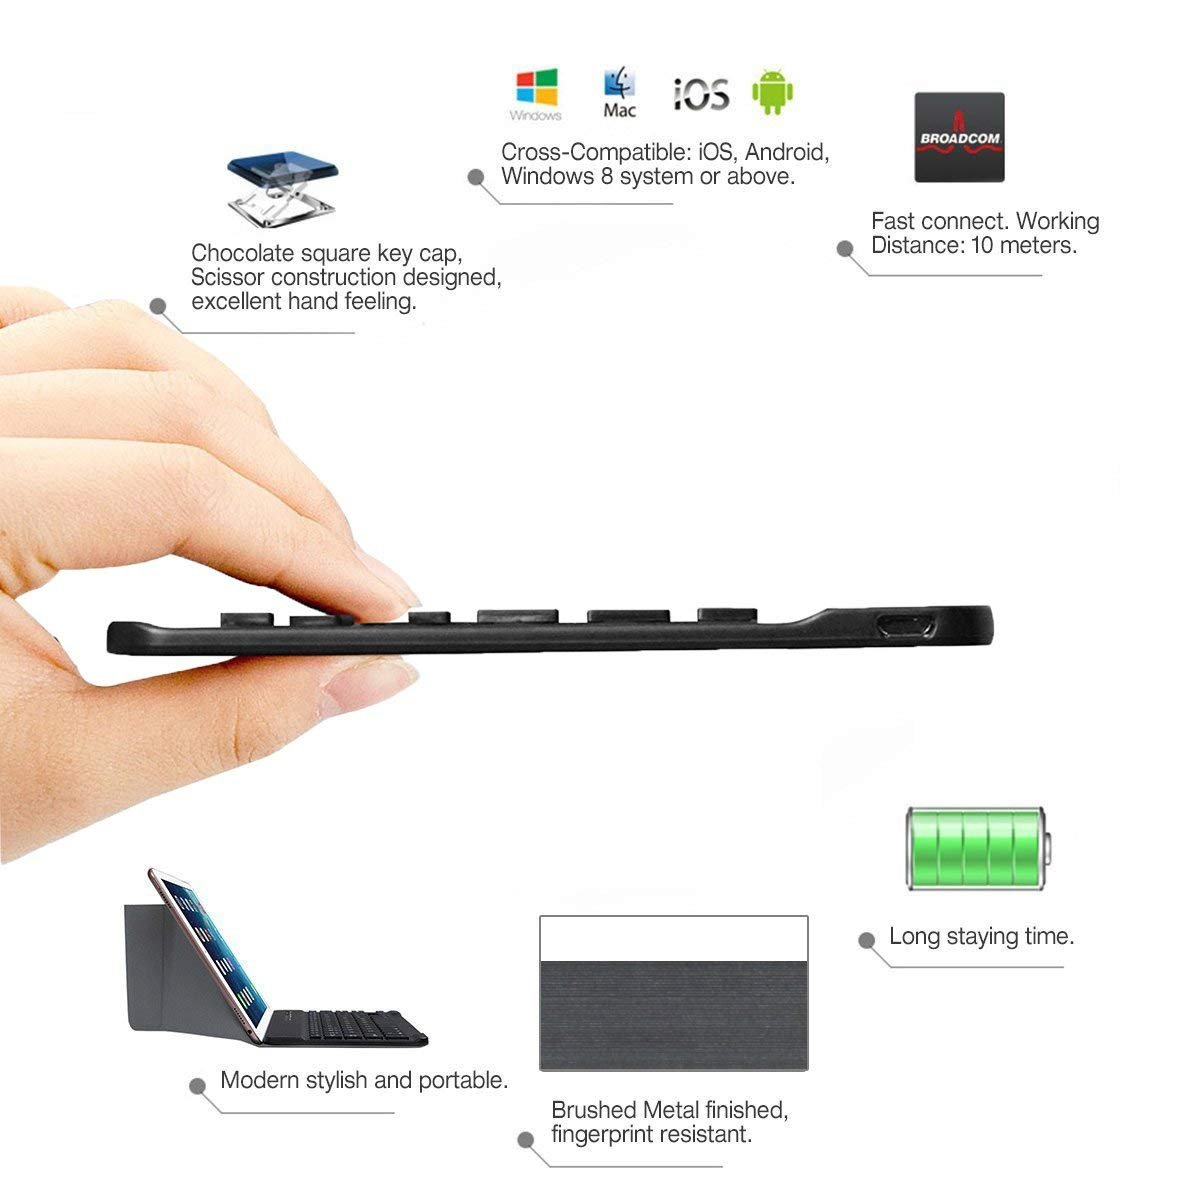 Windows //IOS-Smartphone Tablet,Samsung Galaxy Tab,Google Nexus Tempo QWERTY Italiano Layout Tastiera Wireless Bluetooth Keyboard 7 Compatibile Qualsiasi Android Fire-nero